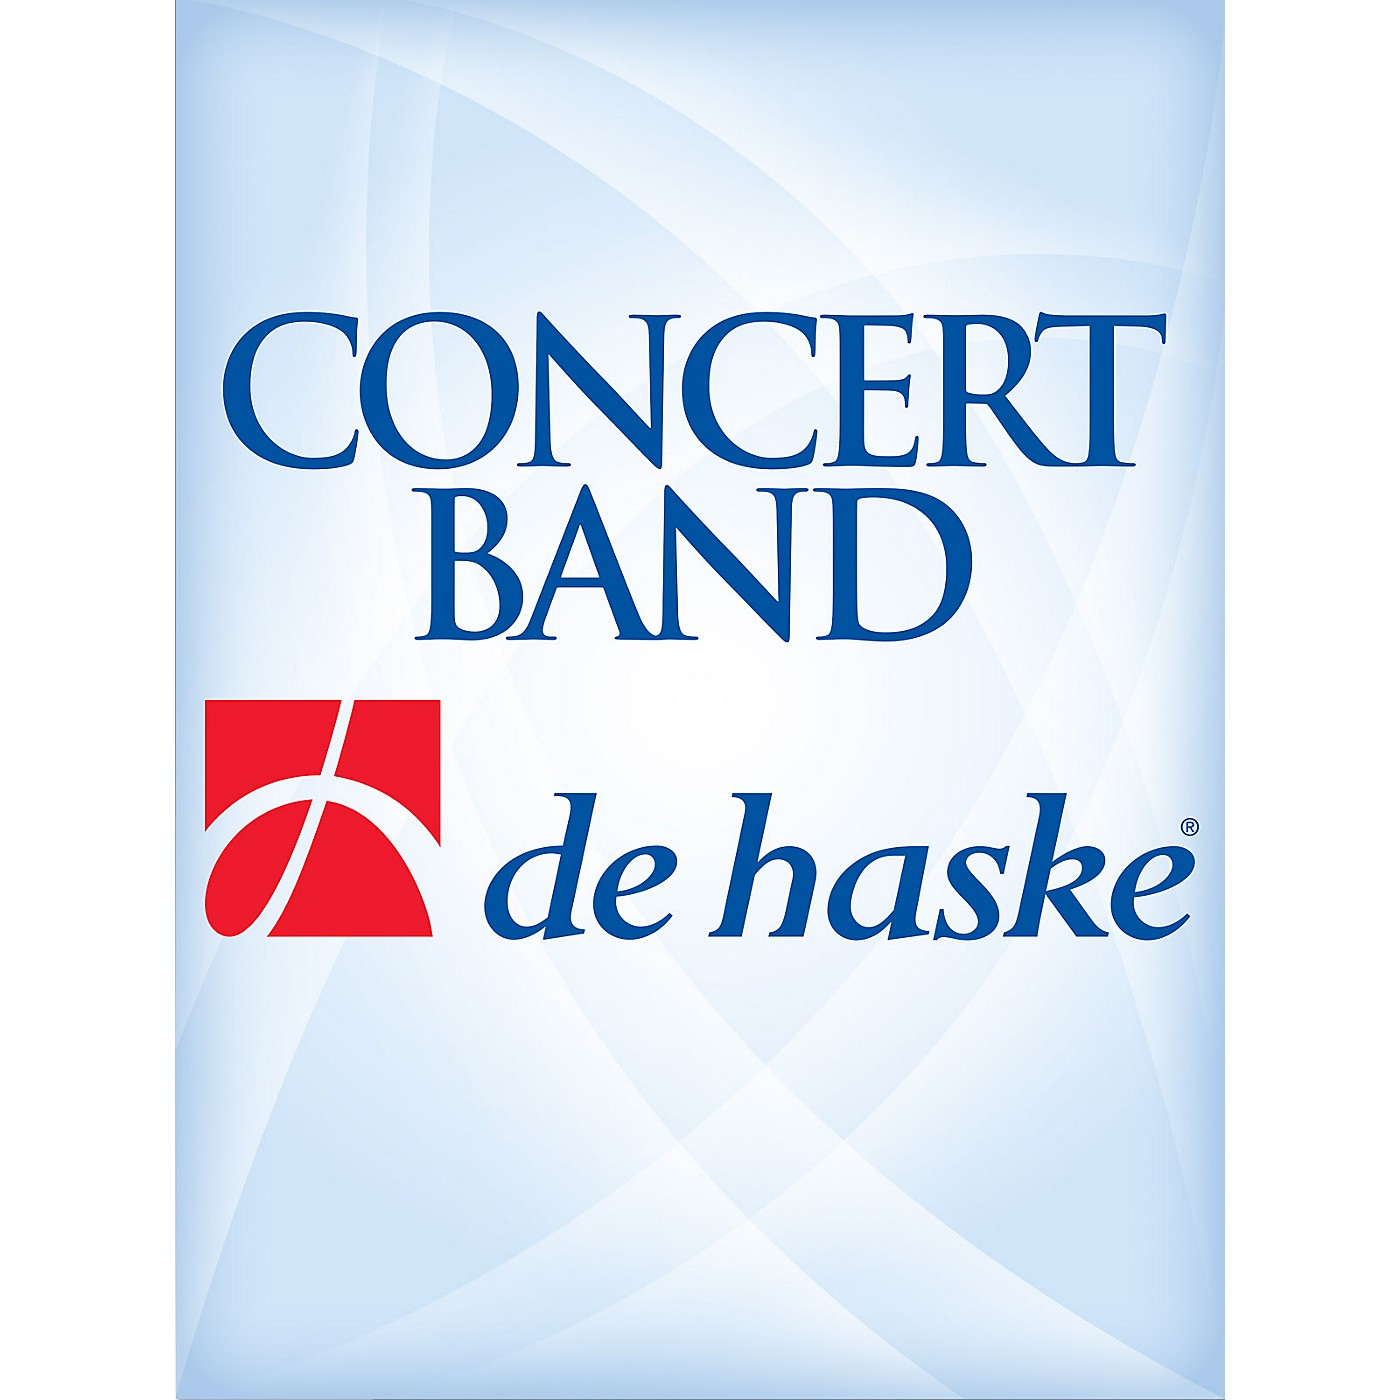 De Haske Music Seahawk (Symphonic Band - Grade 5 - Score and Parts) Concert Band Level 5 Arranged by Jan Hadermann thumbnail